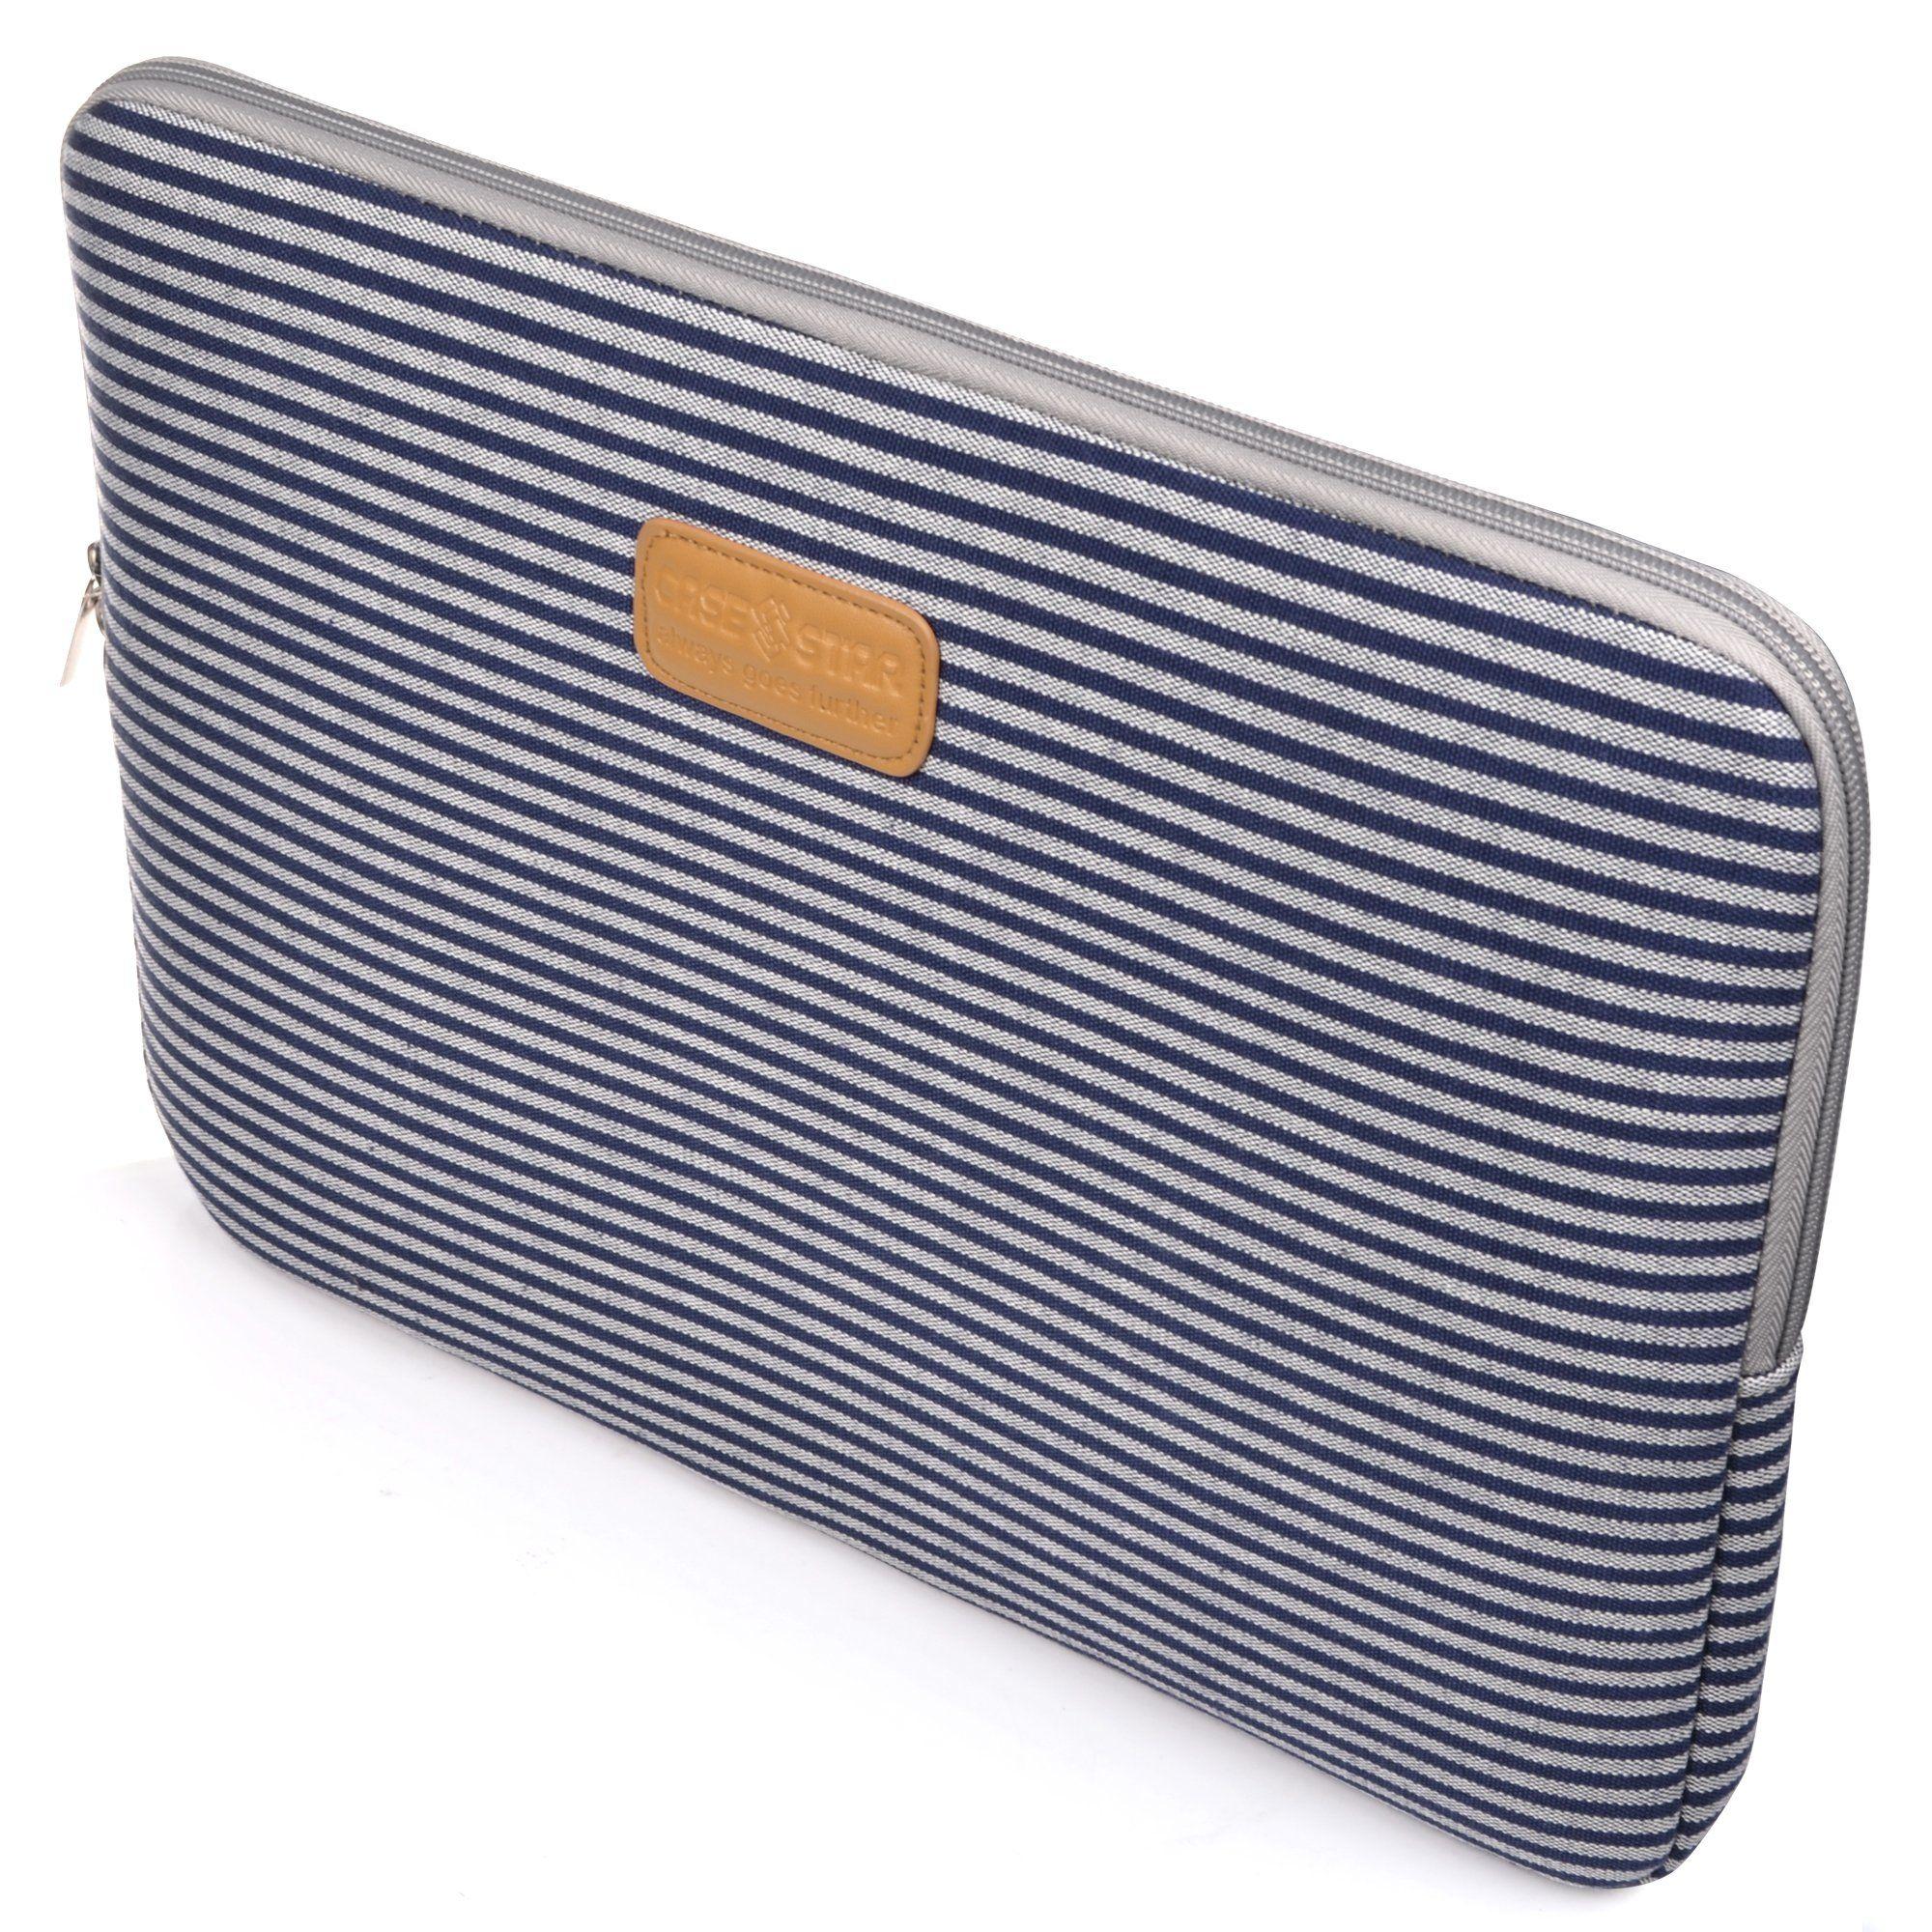 Robot Check 13 Inch Laptop Sleeve Canvas Laptop Bag Macbook Pro Case